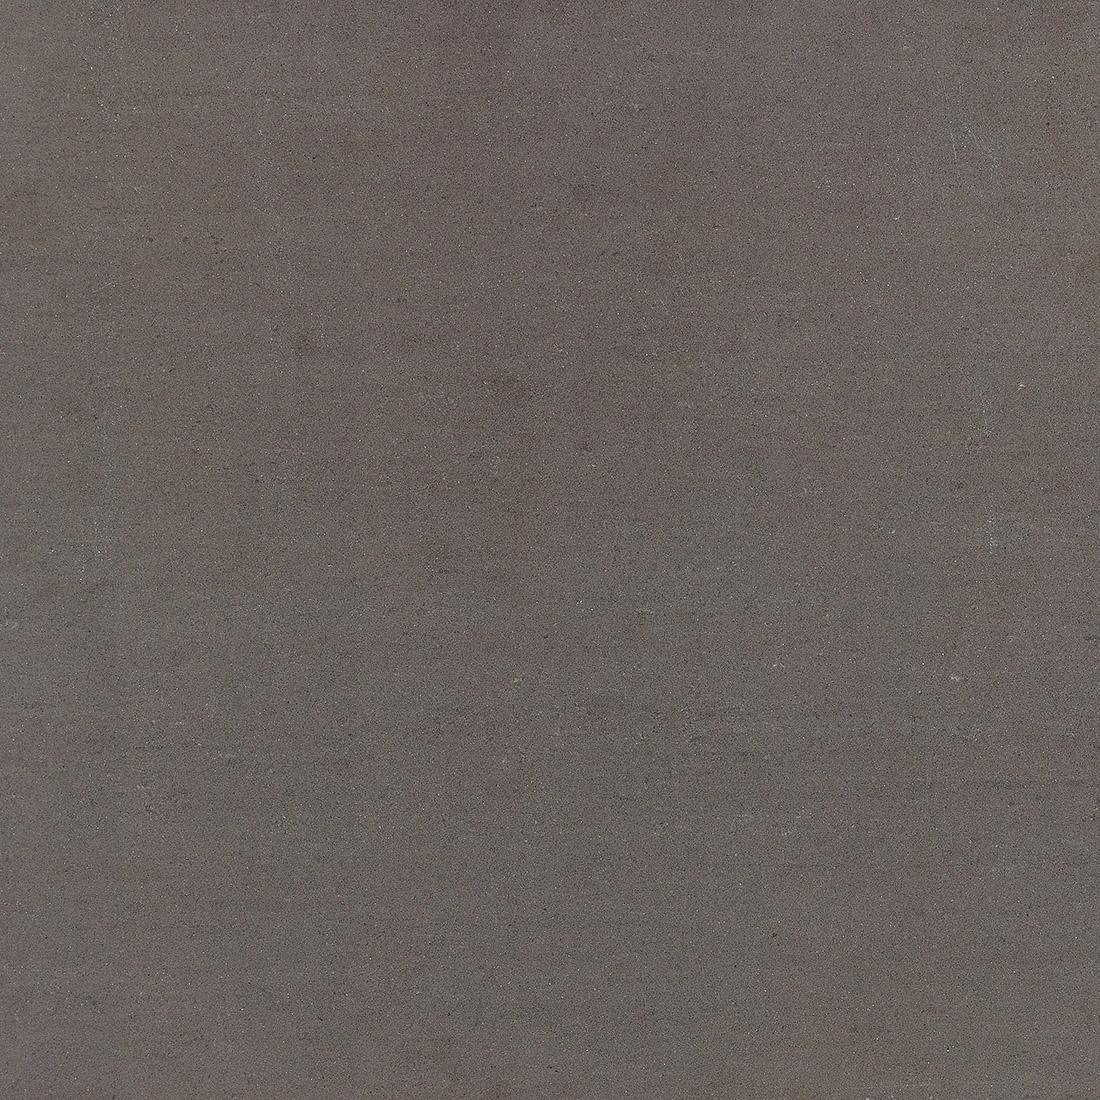 Crystal 60x60 Dark Grey Matt 1